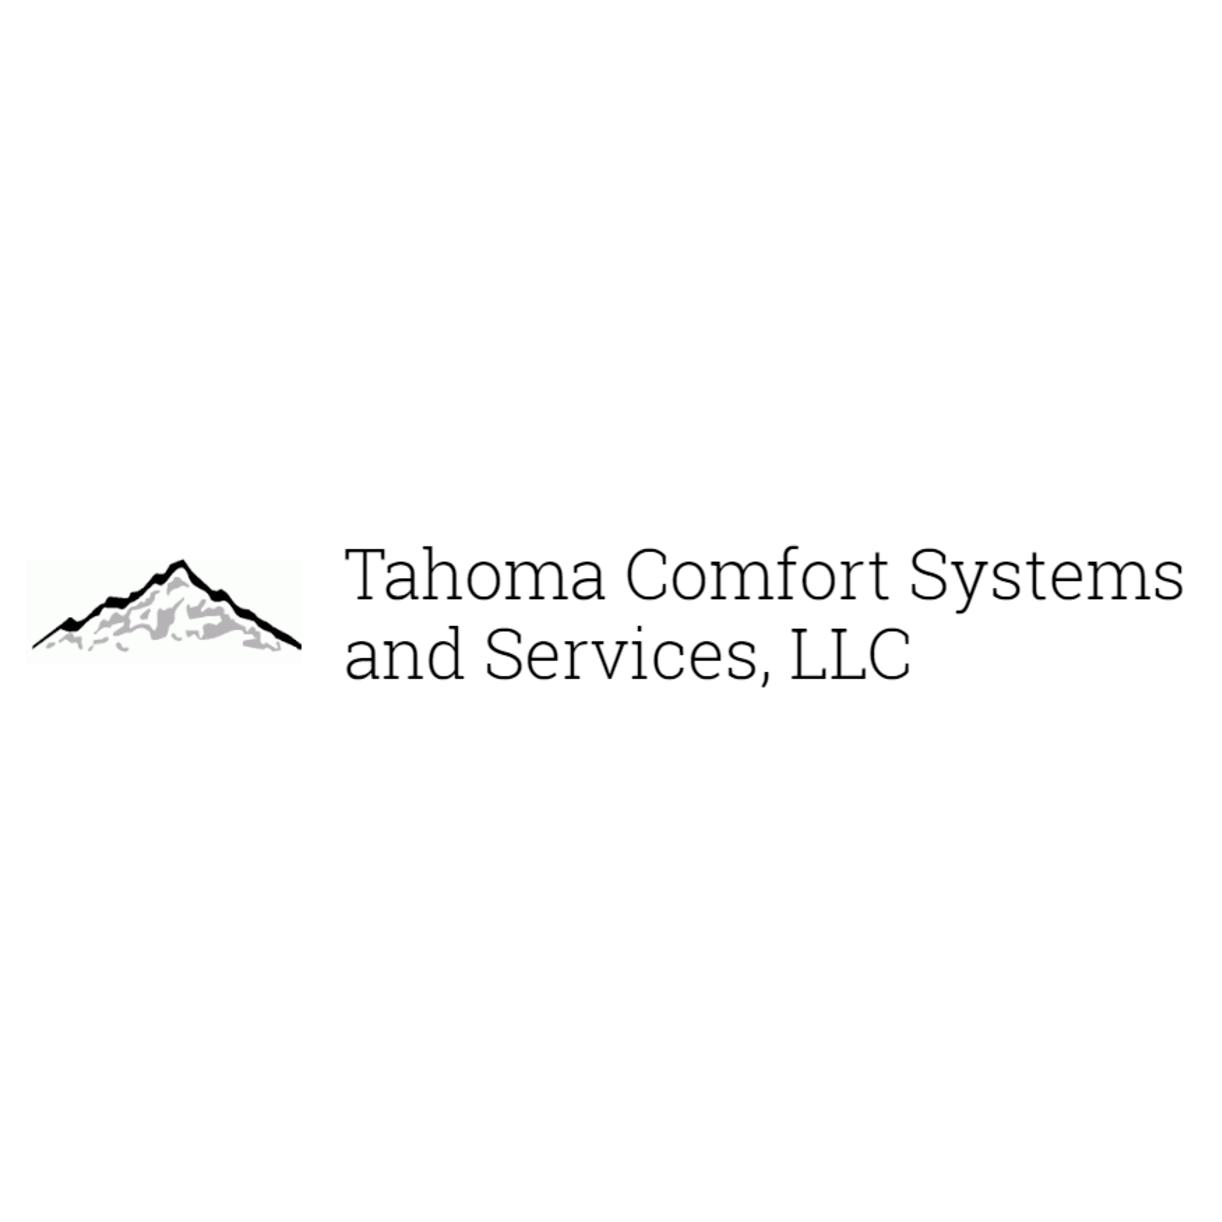 Tahoma Comfort